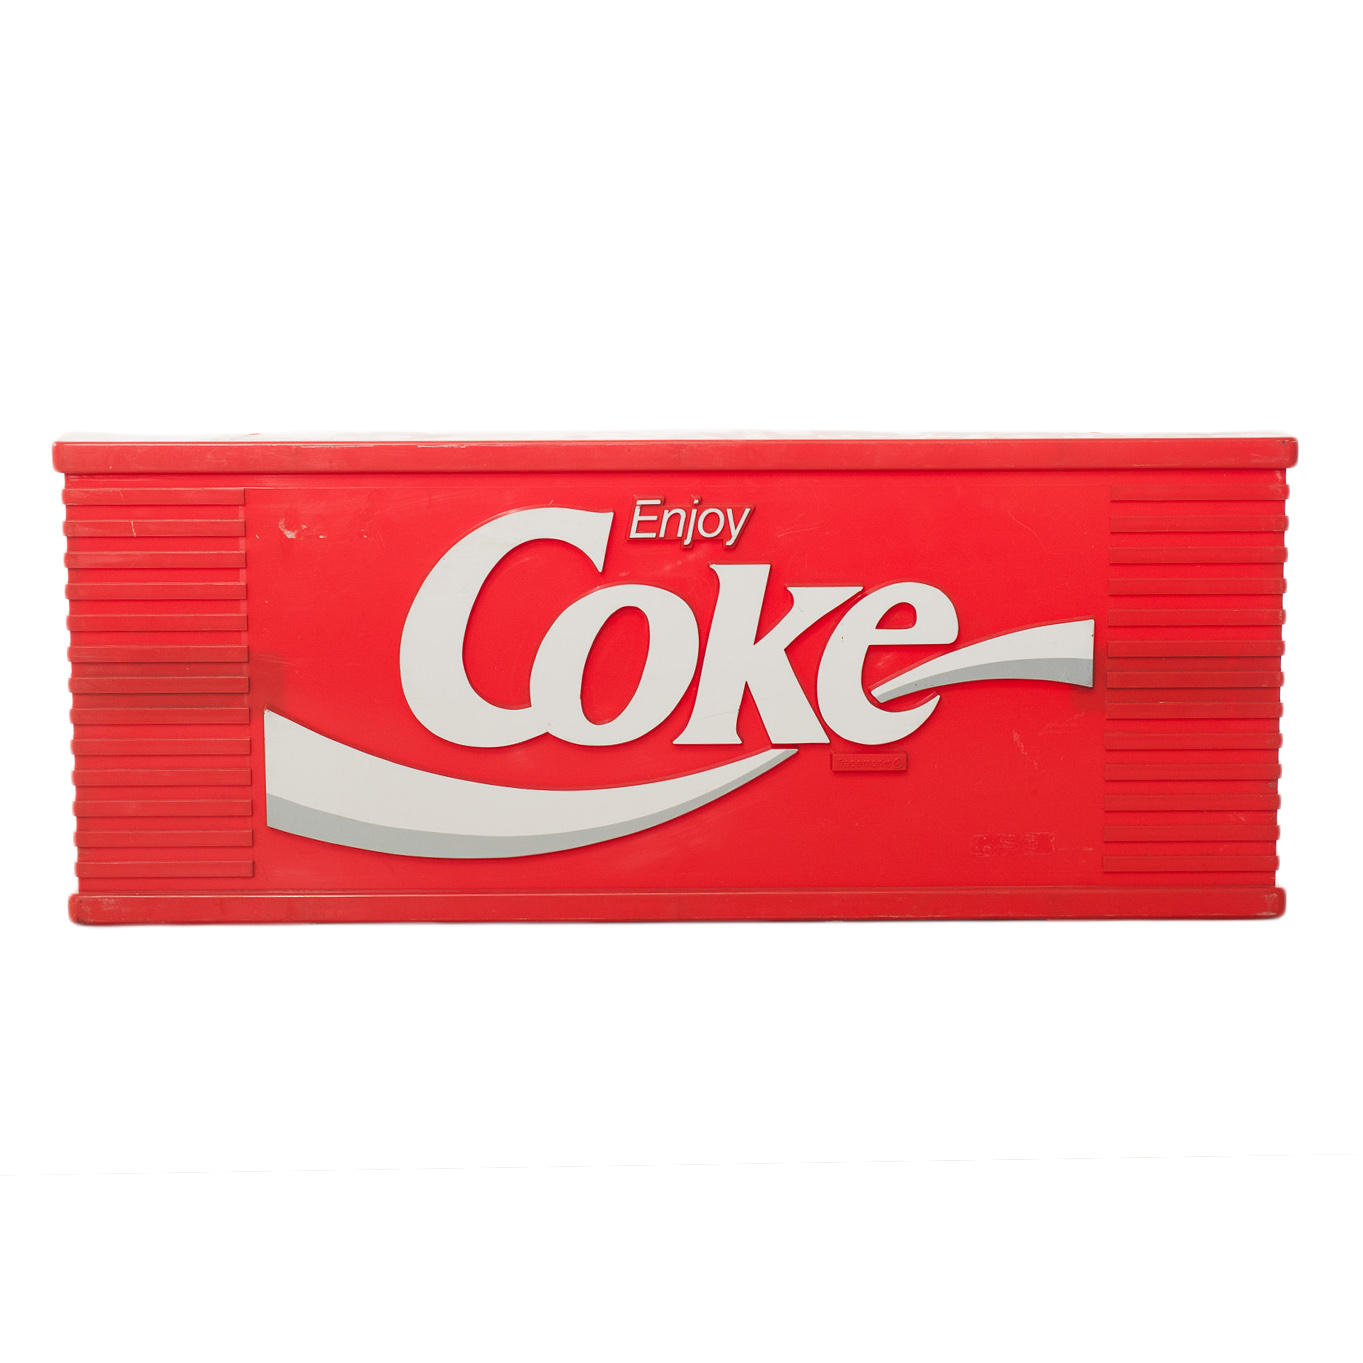 ENJOY Coke Sign